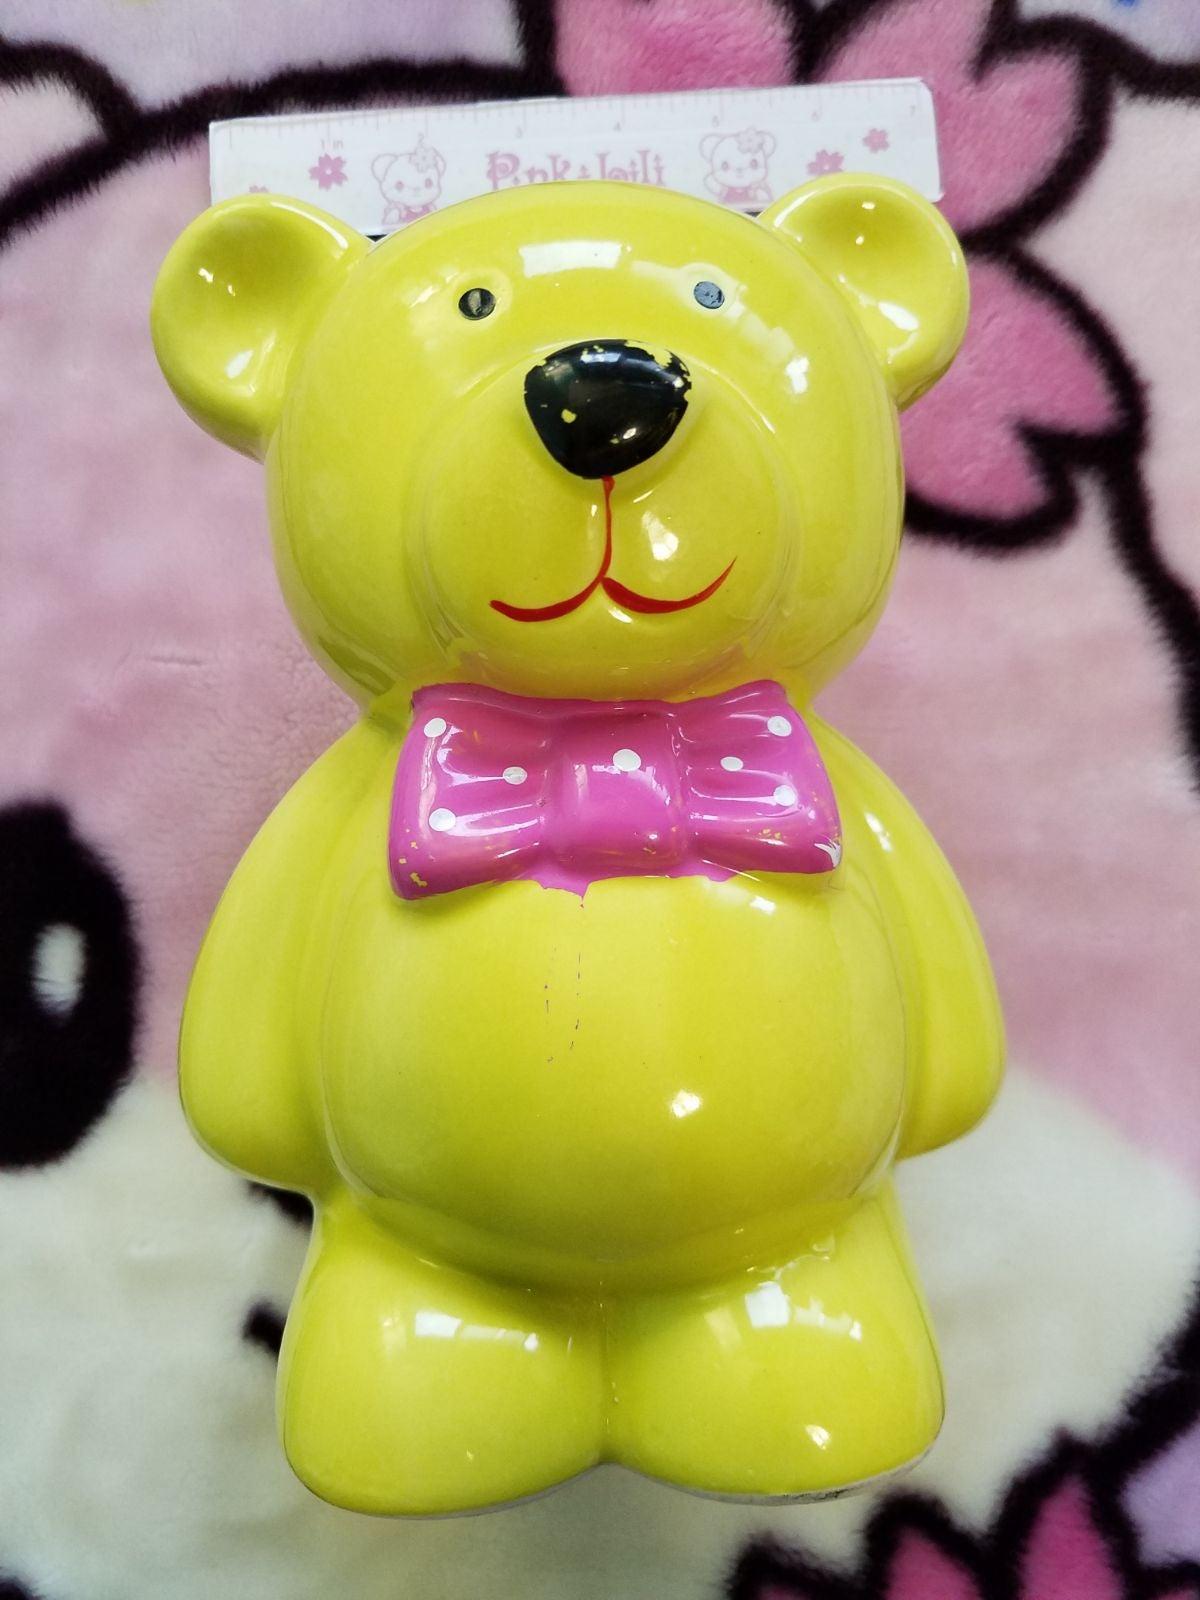 Teddy bear bank statue